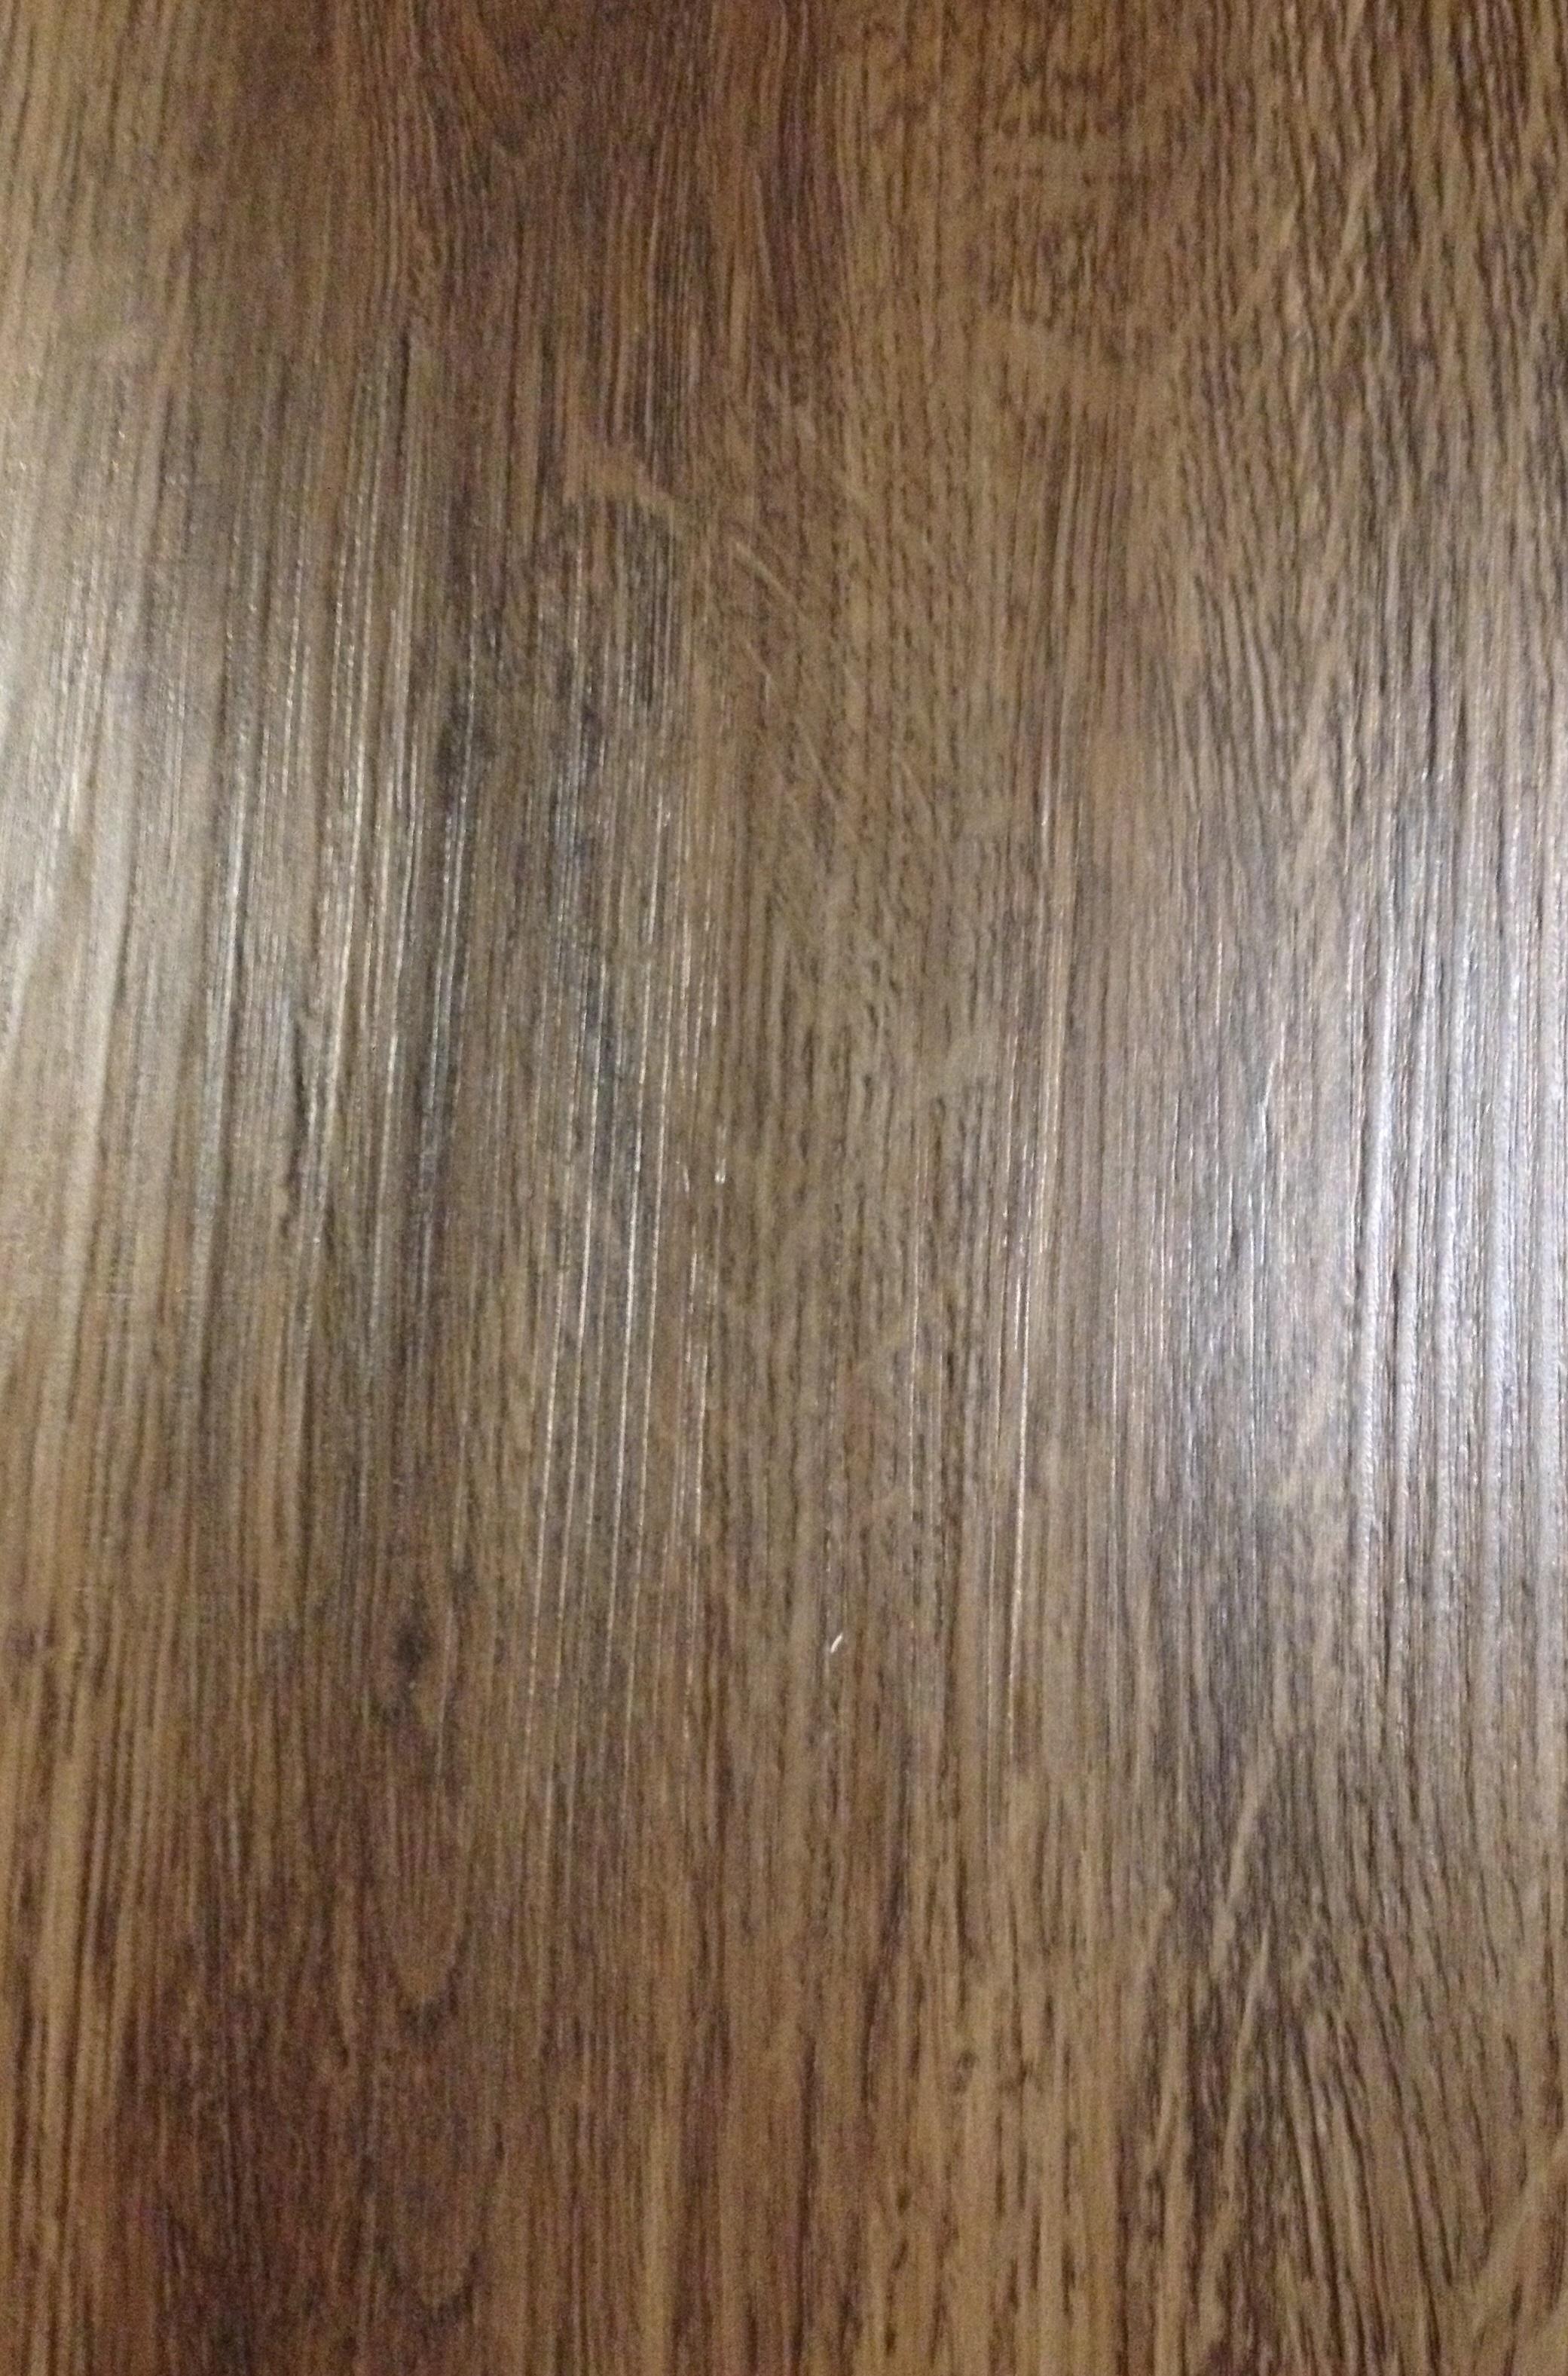 Shaw-P-Vintage Oak